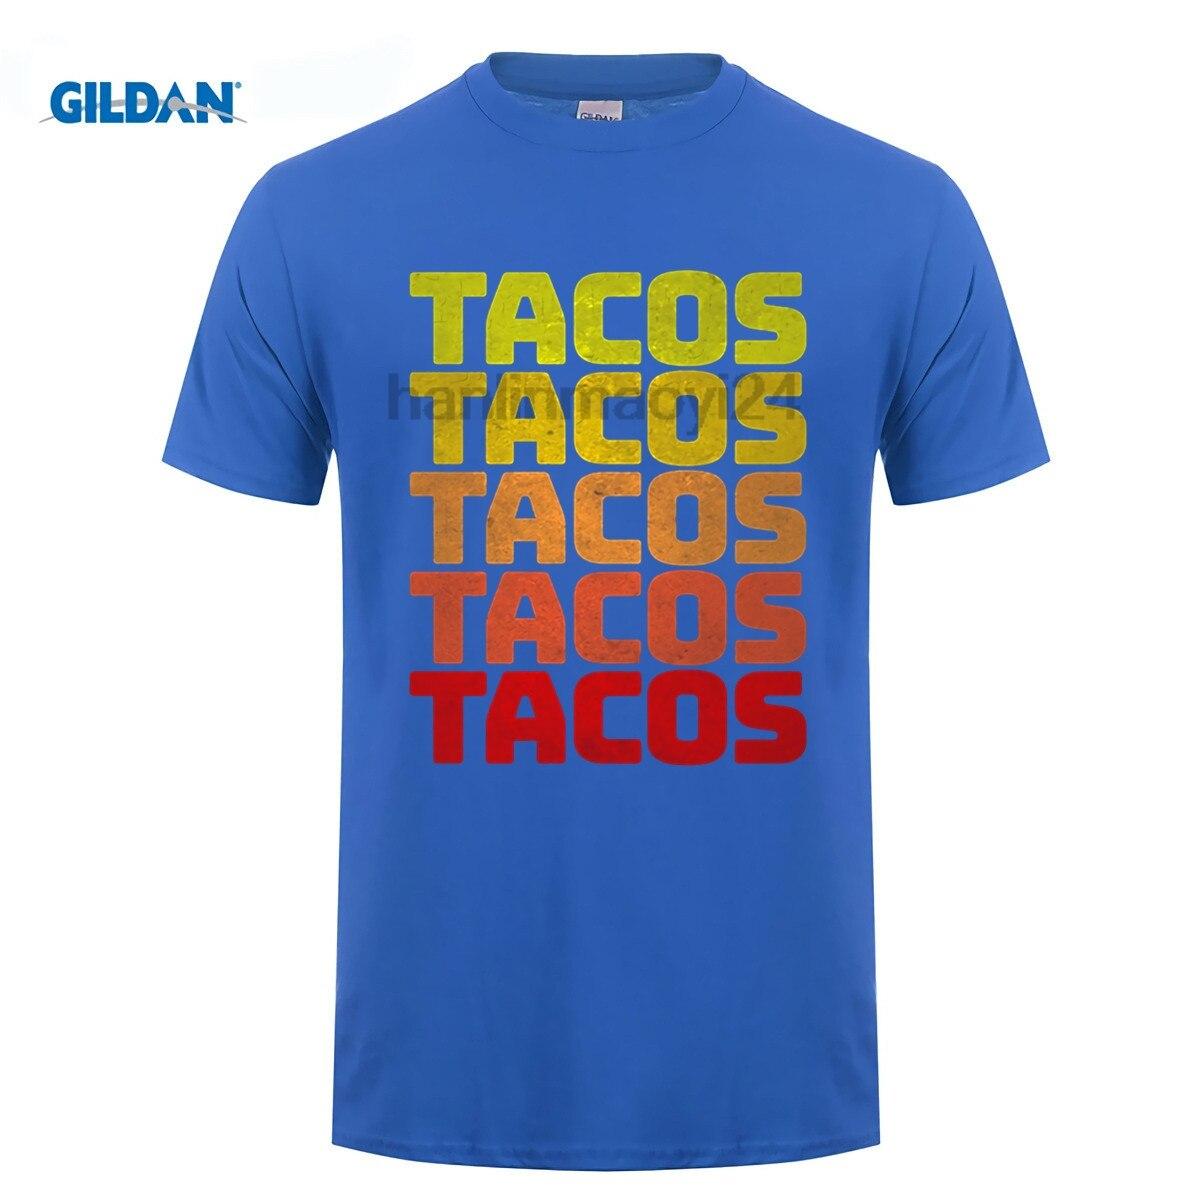 GILDAN Retro Taco Shirts Vintage Cinco De Mayo T-Shirt Tuesday ...